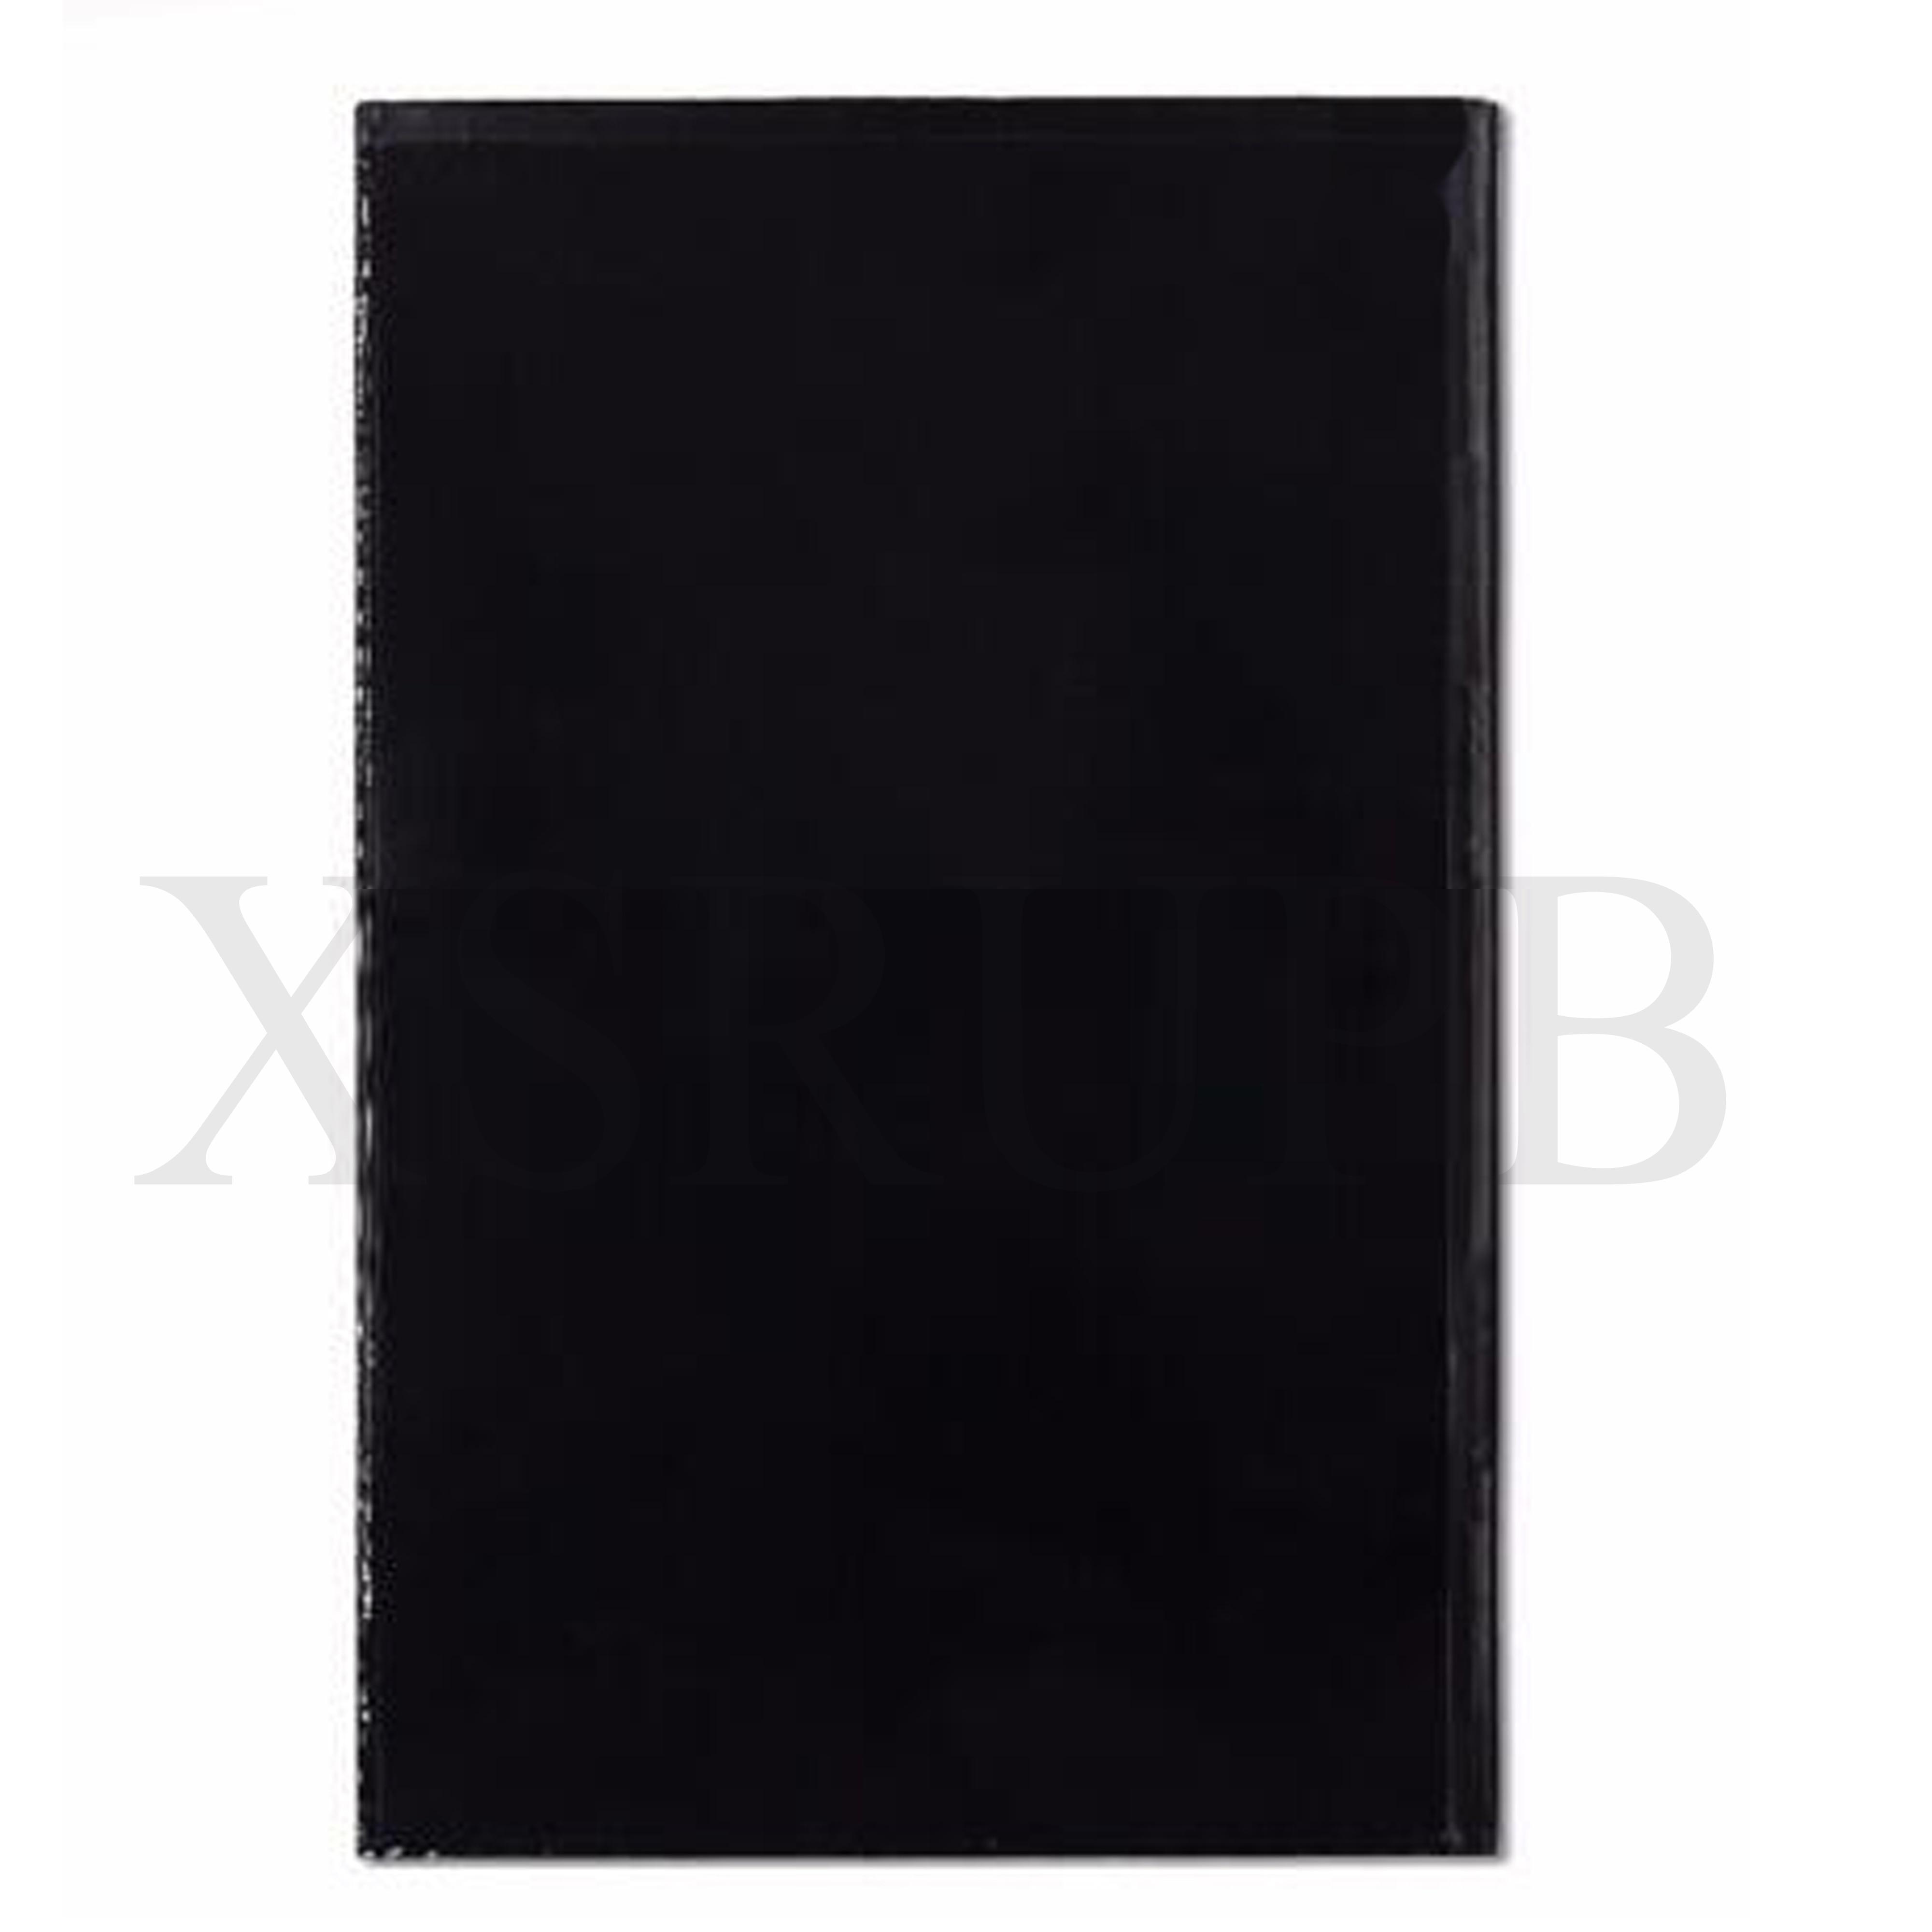 Original LCD screen HJ070IA-02F free shipping<br>